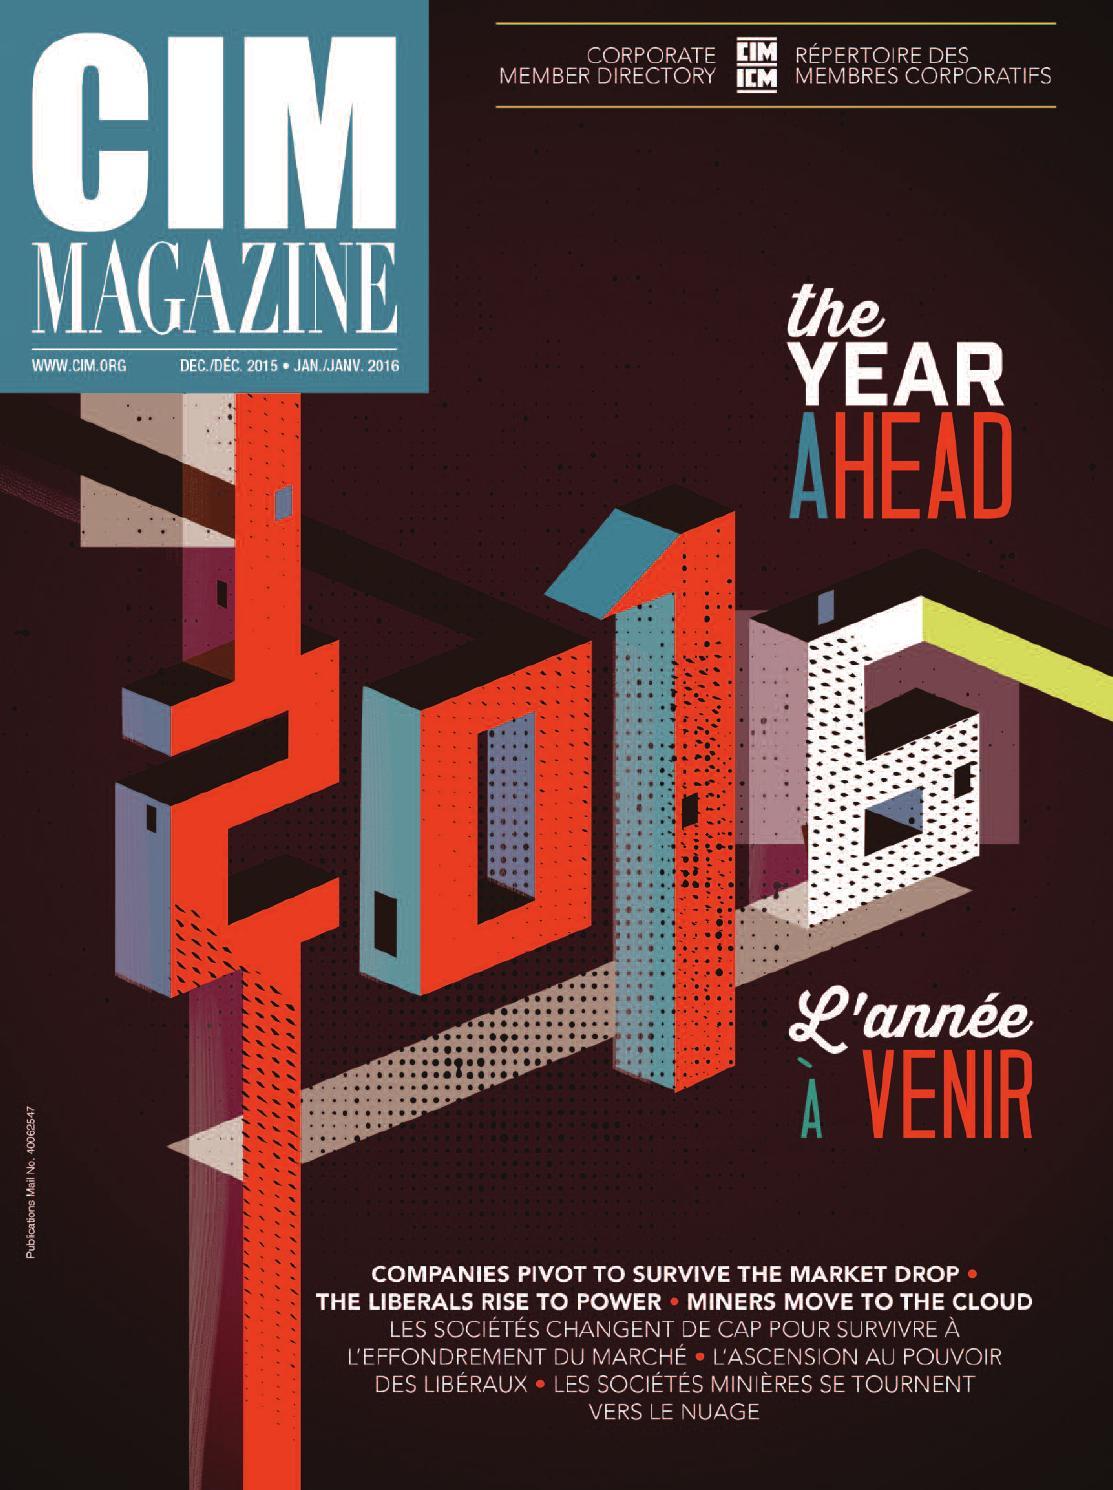 cim magazine december 2015 january 2016